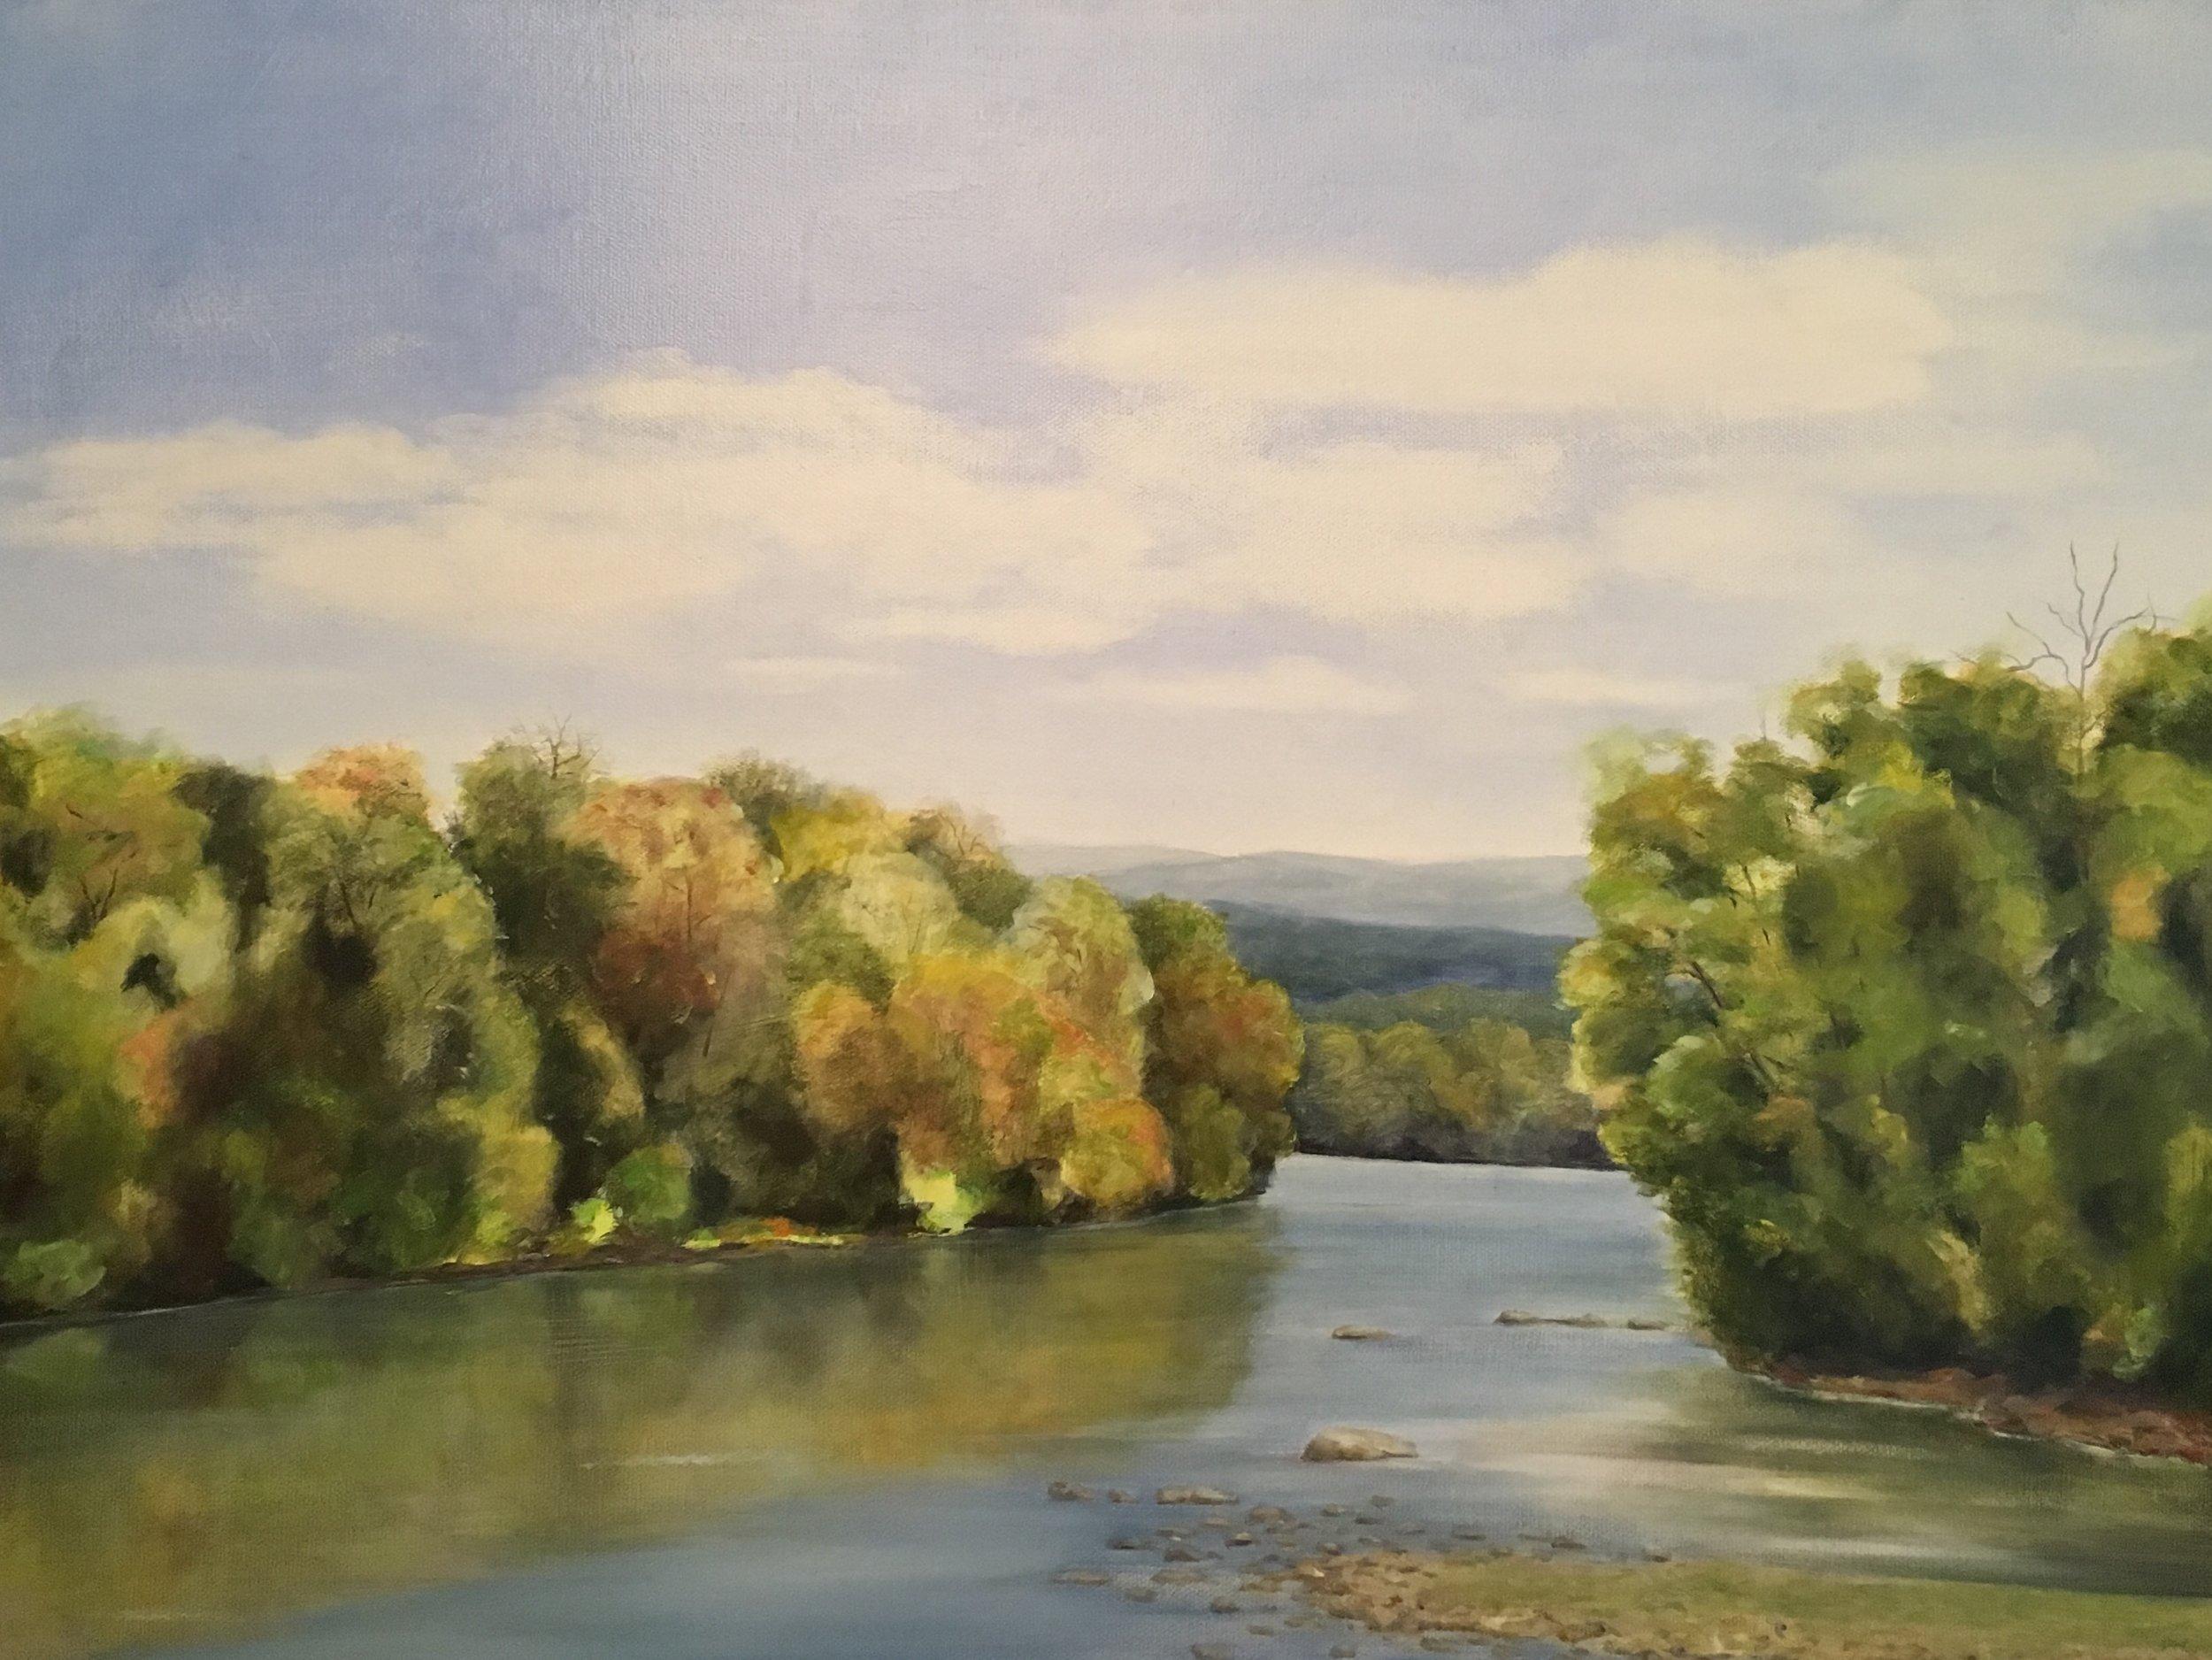 Shenandoah at the Low Bridge; oil on canvas; 18 x 24